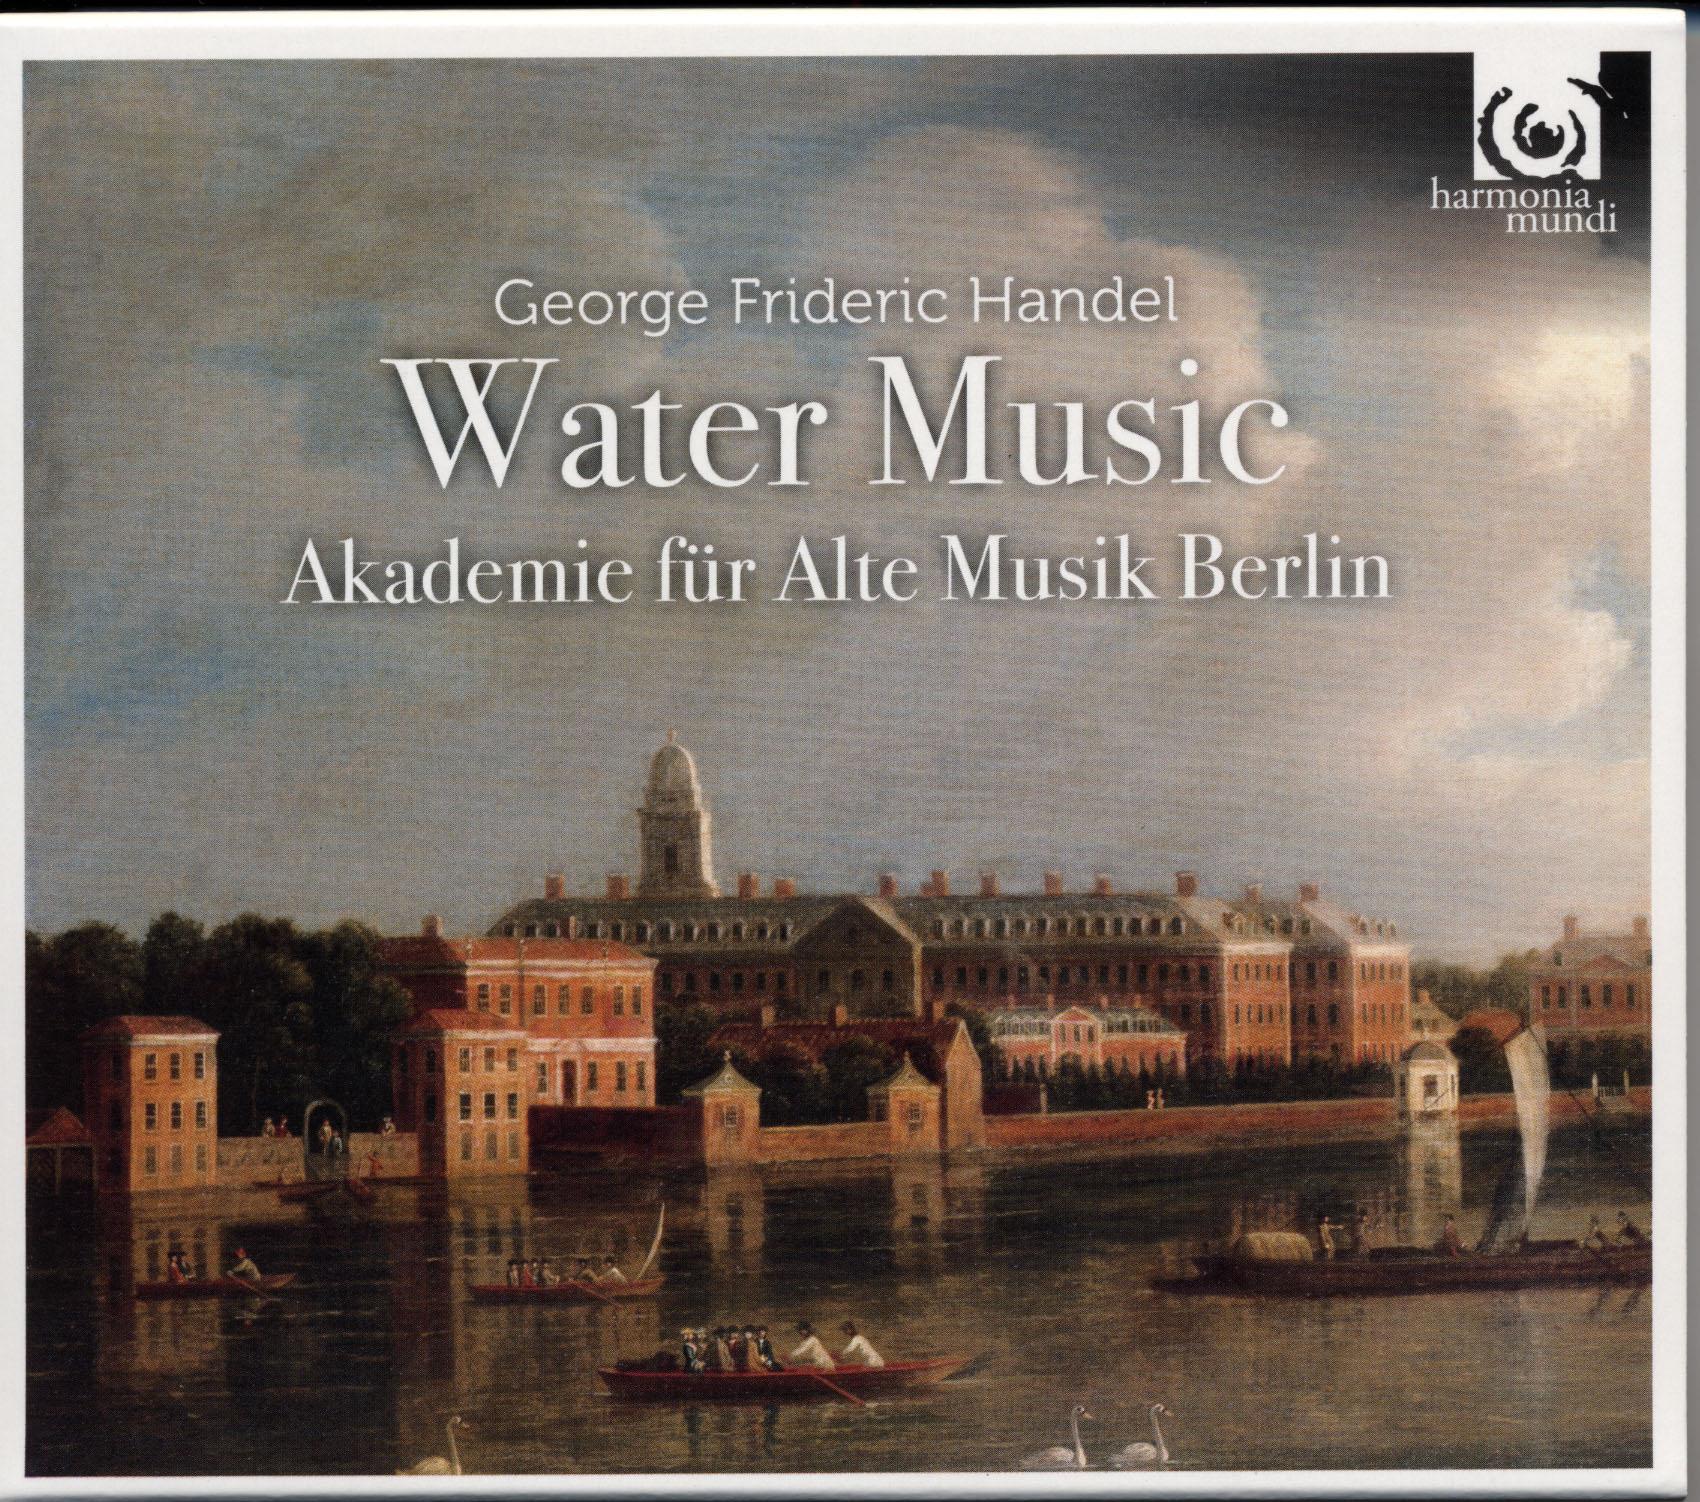 disc HM-Handel-Water Music-Akademie fur Alte Musik Berlin